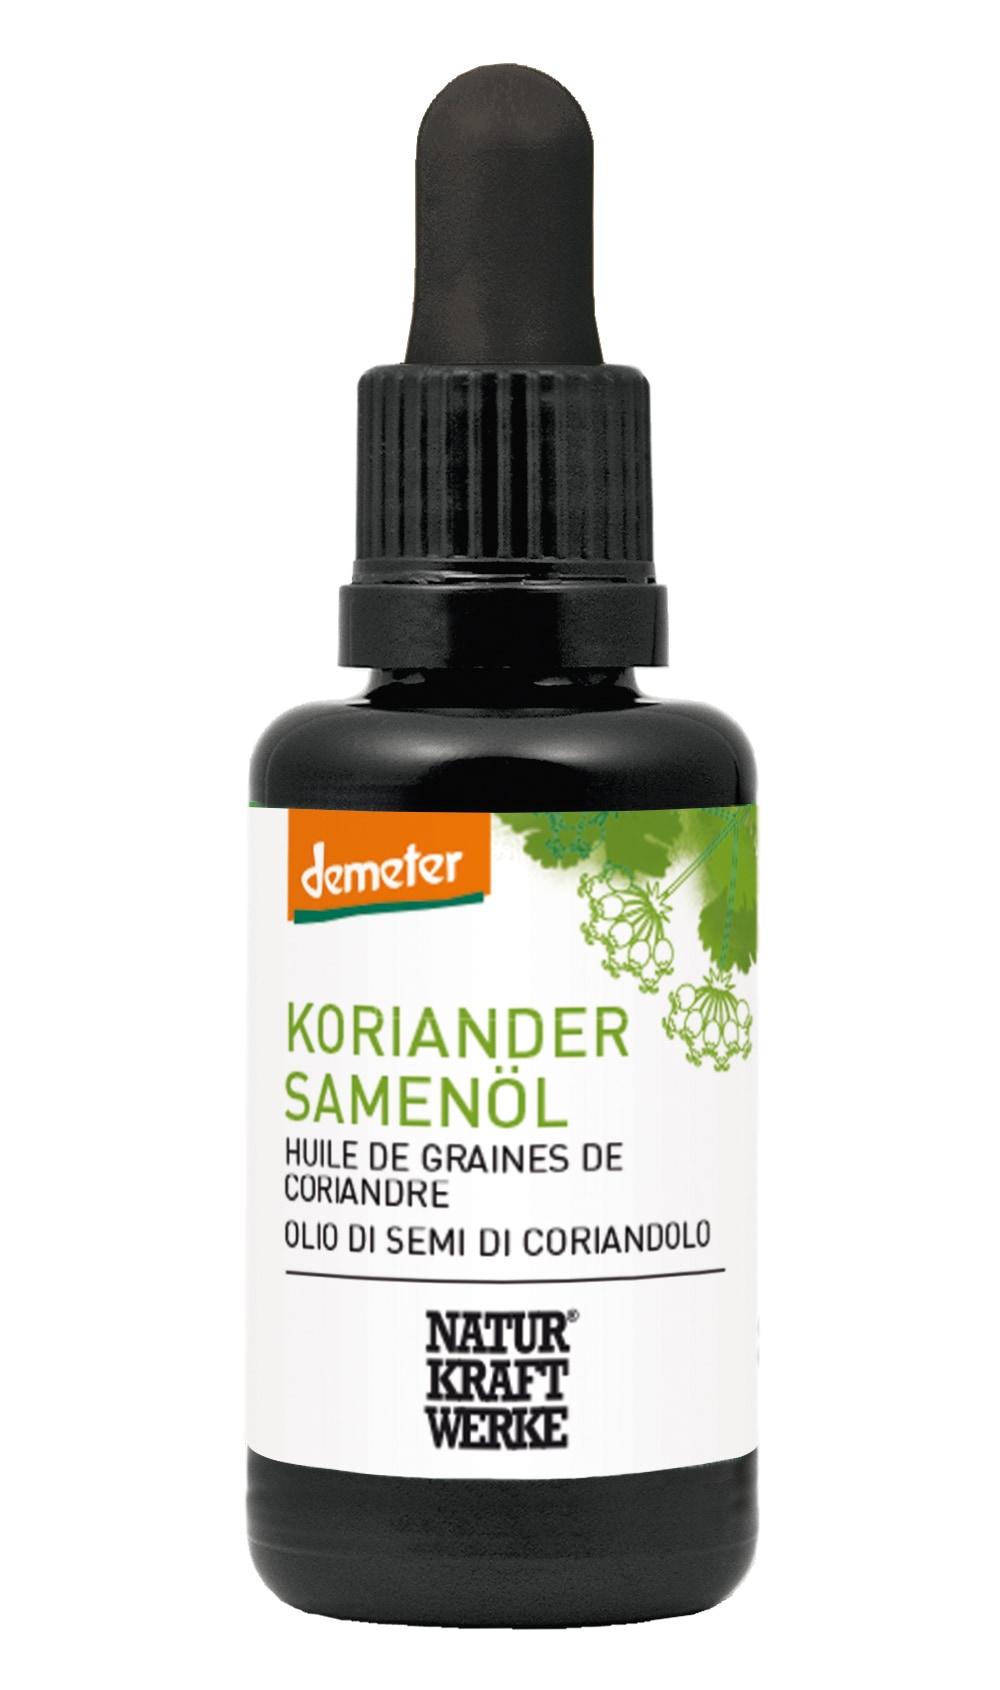 Koriandersamenöl Demeter 30 ml